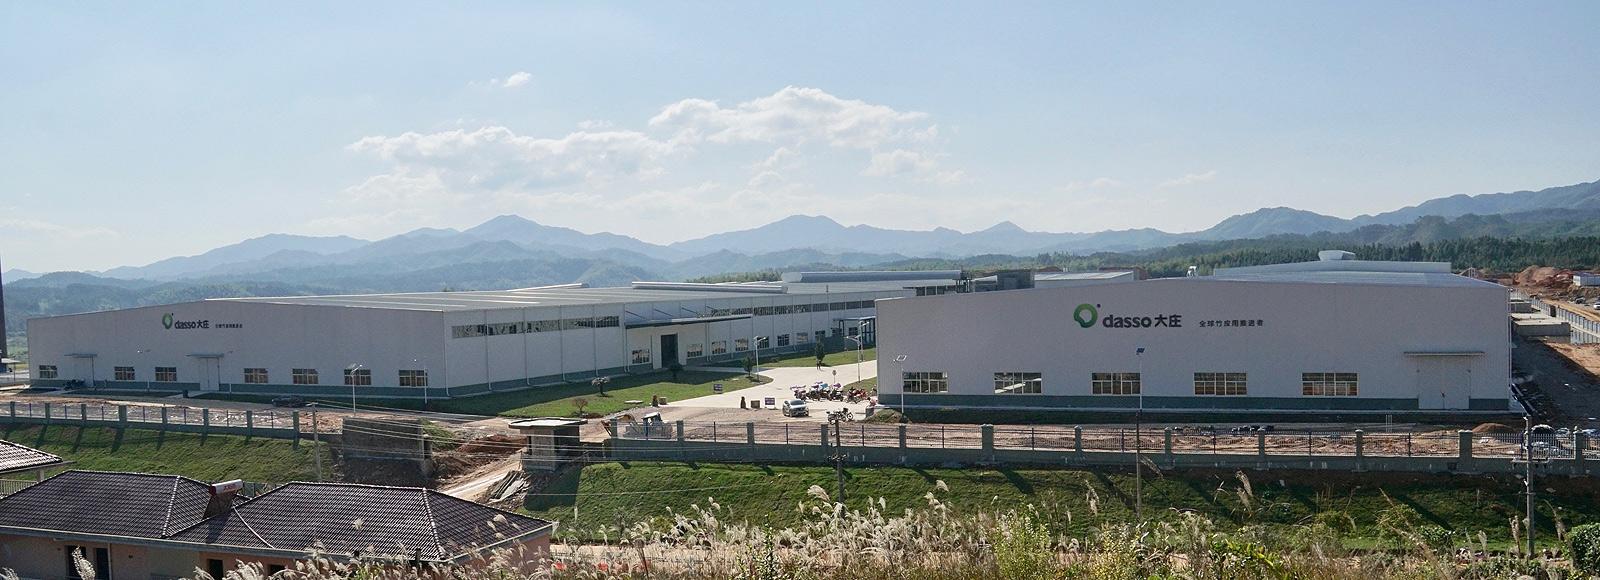 dasso factories